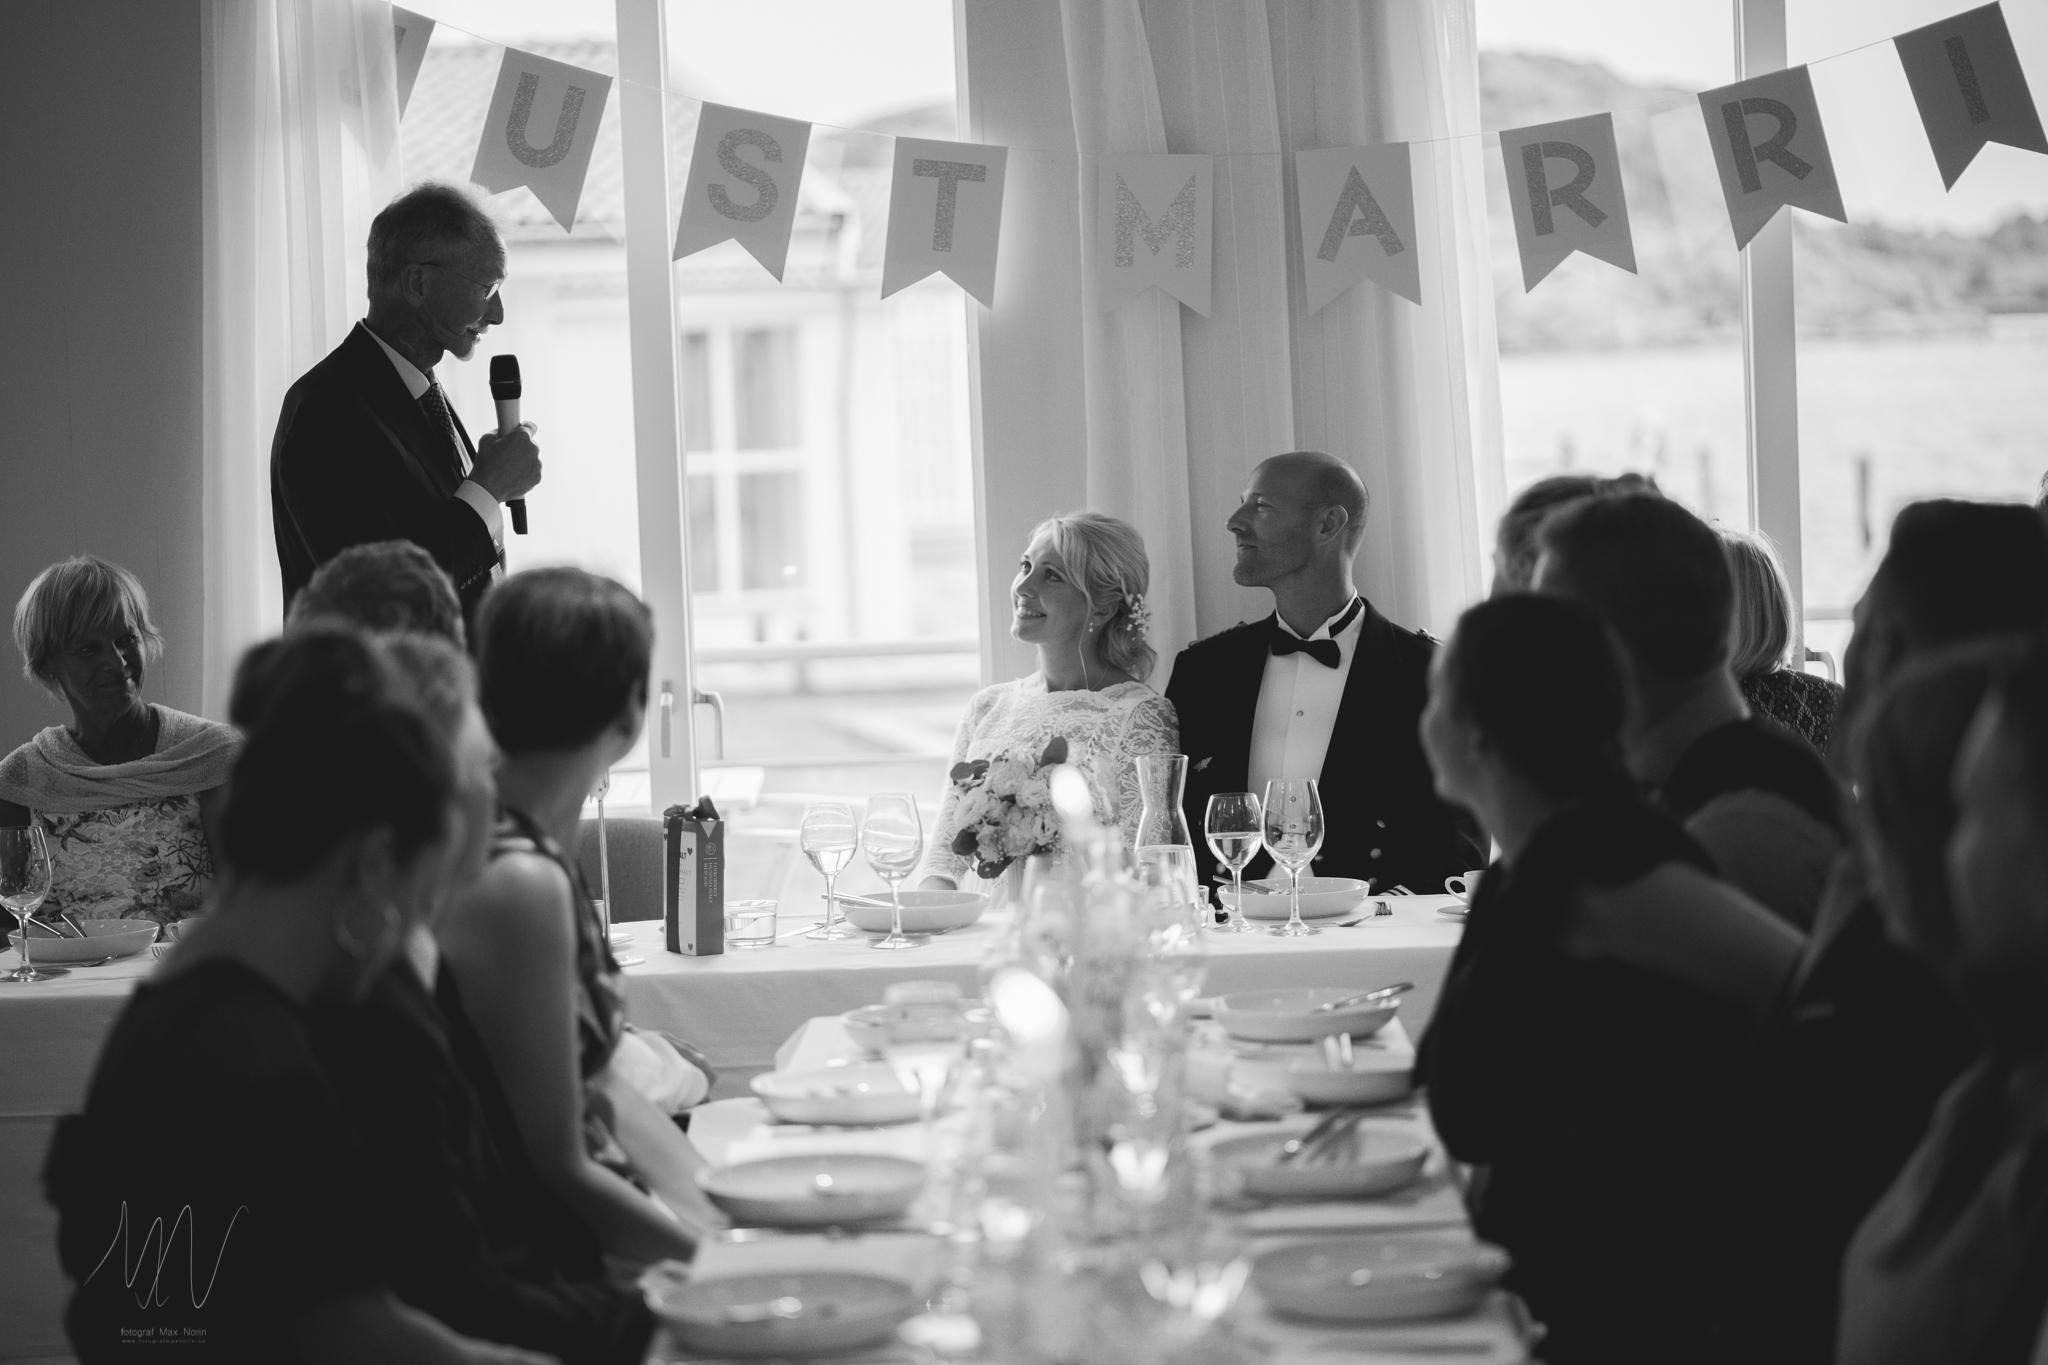 Bröllop-fotografmaxnorin.se-MariaMarcus-458.JPG